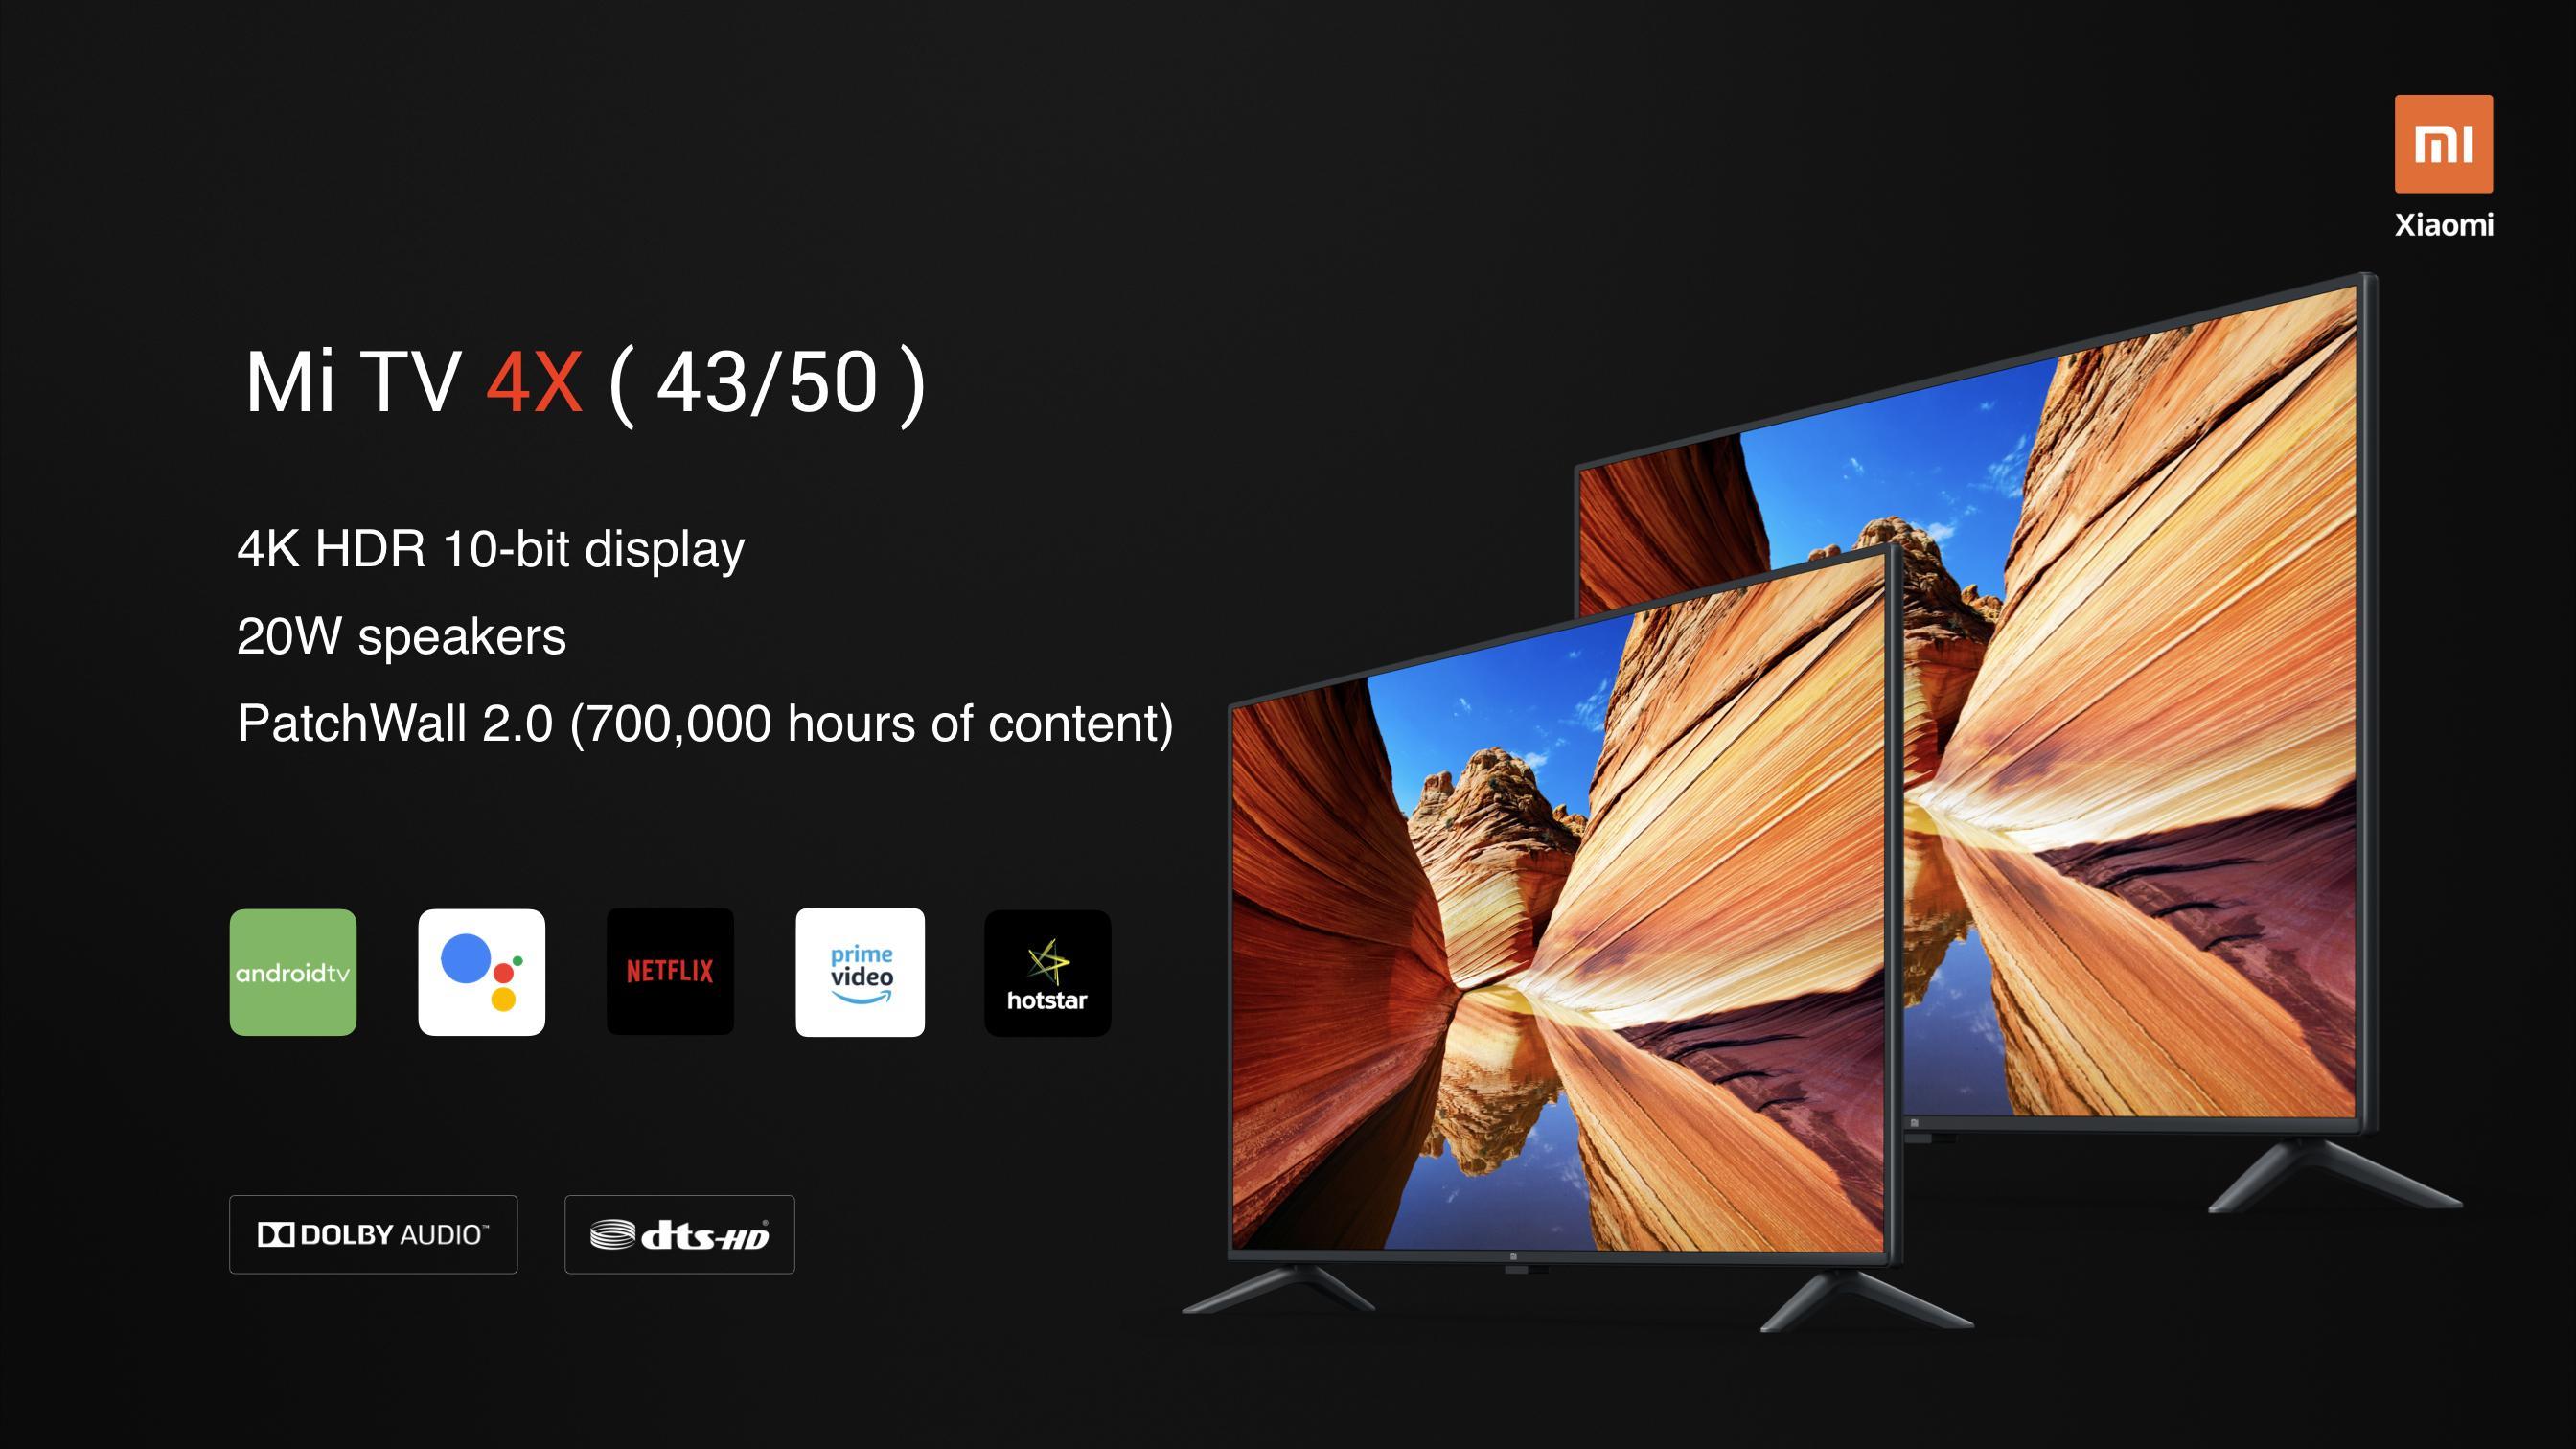 Mi TV 4X (43/50)